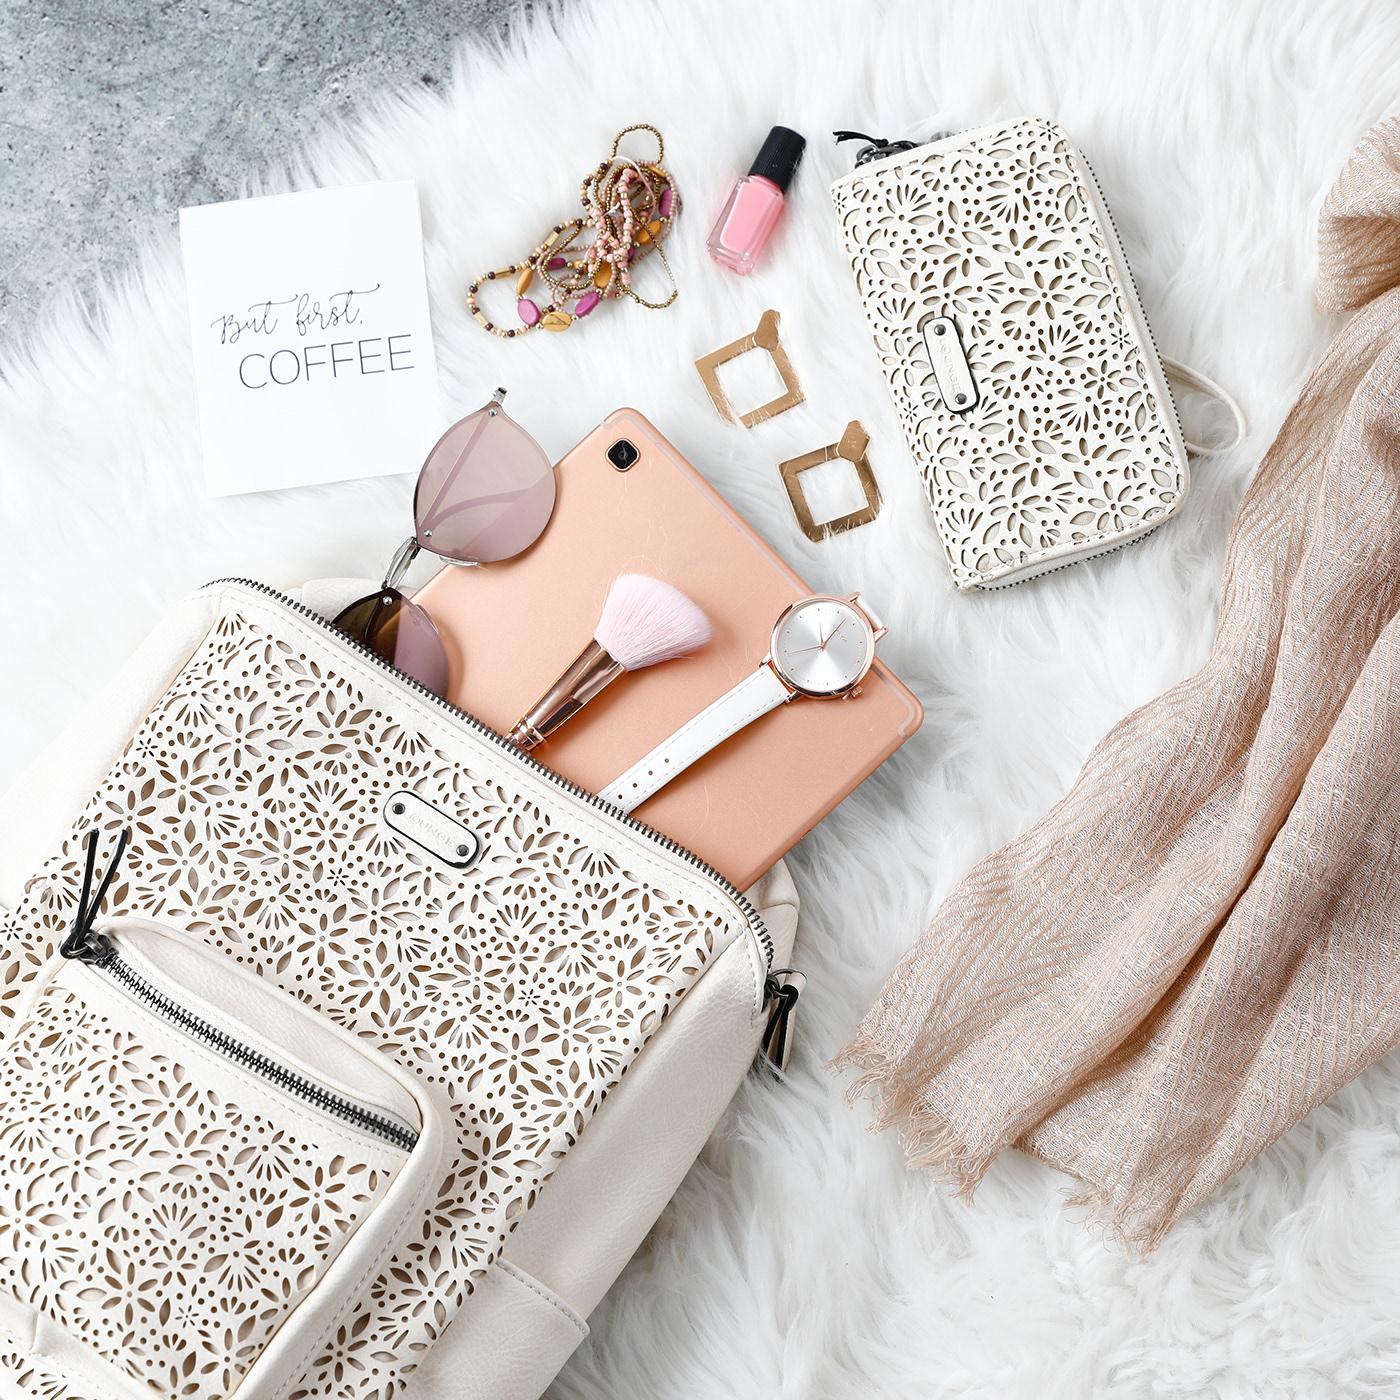 Image may contain: fashion accessory, fashion and accessory